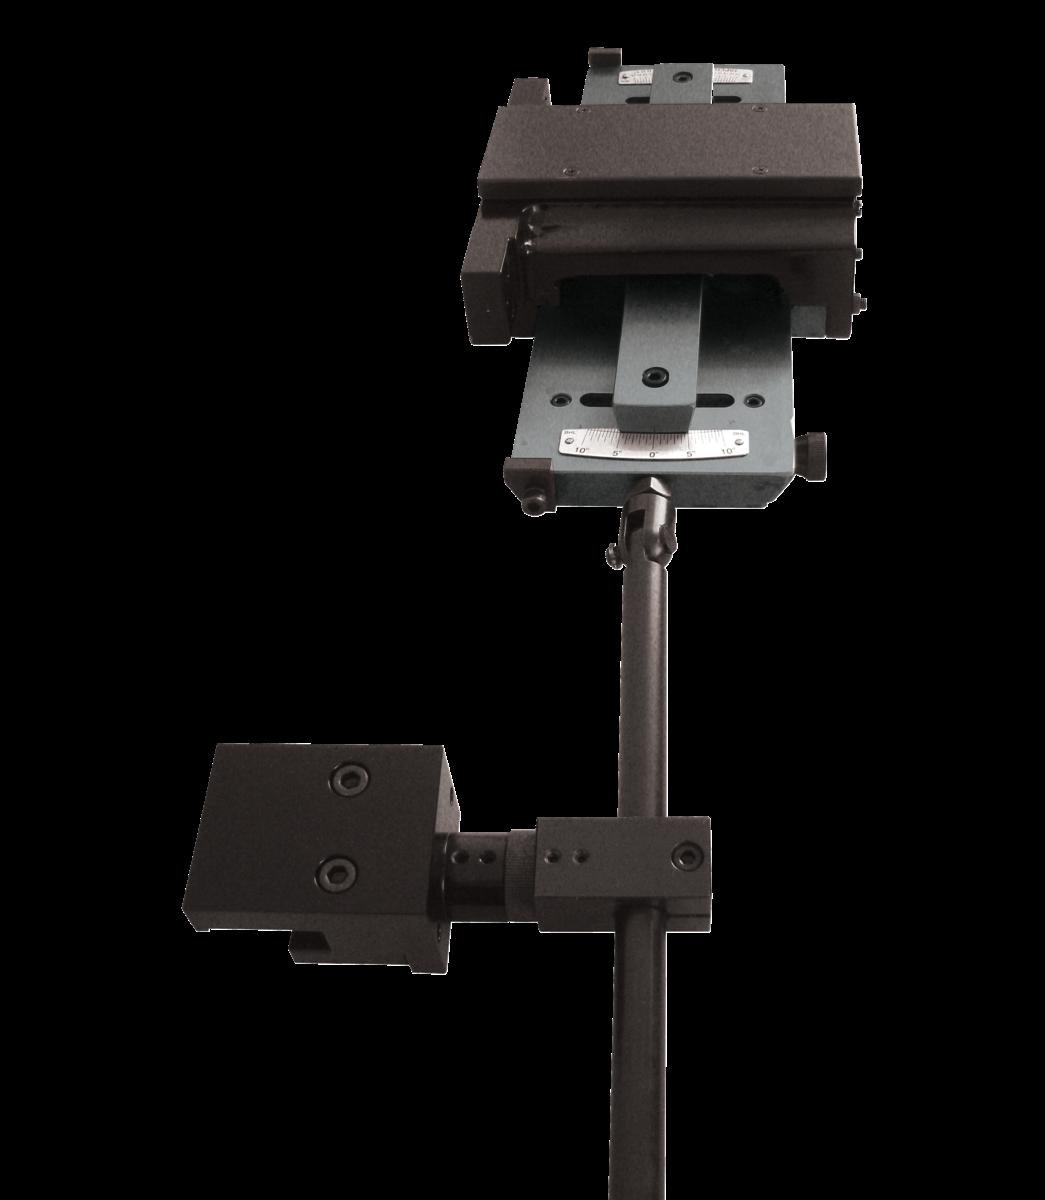 Taper Attachment for ELITE EGH-1740 and EGH-1760 Lathes